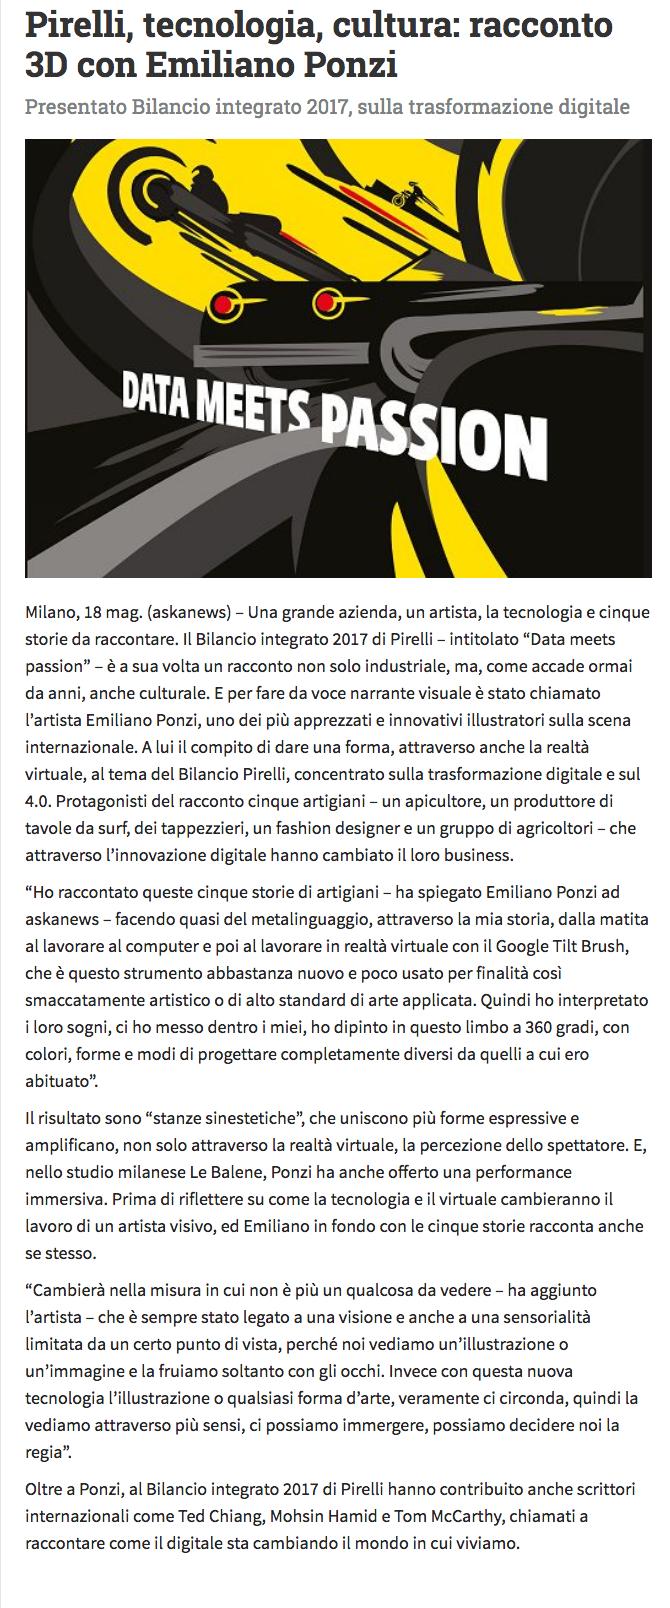 Pirelli, Aska News Emiliano Ponzi